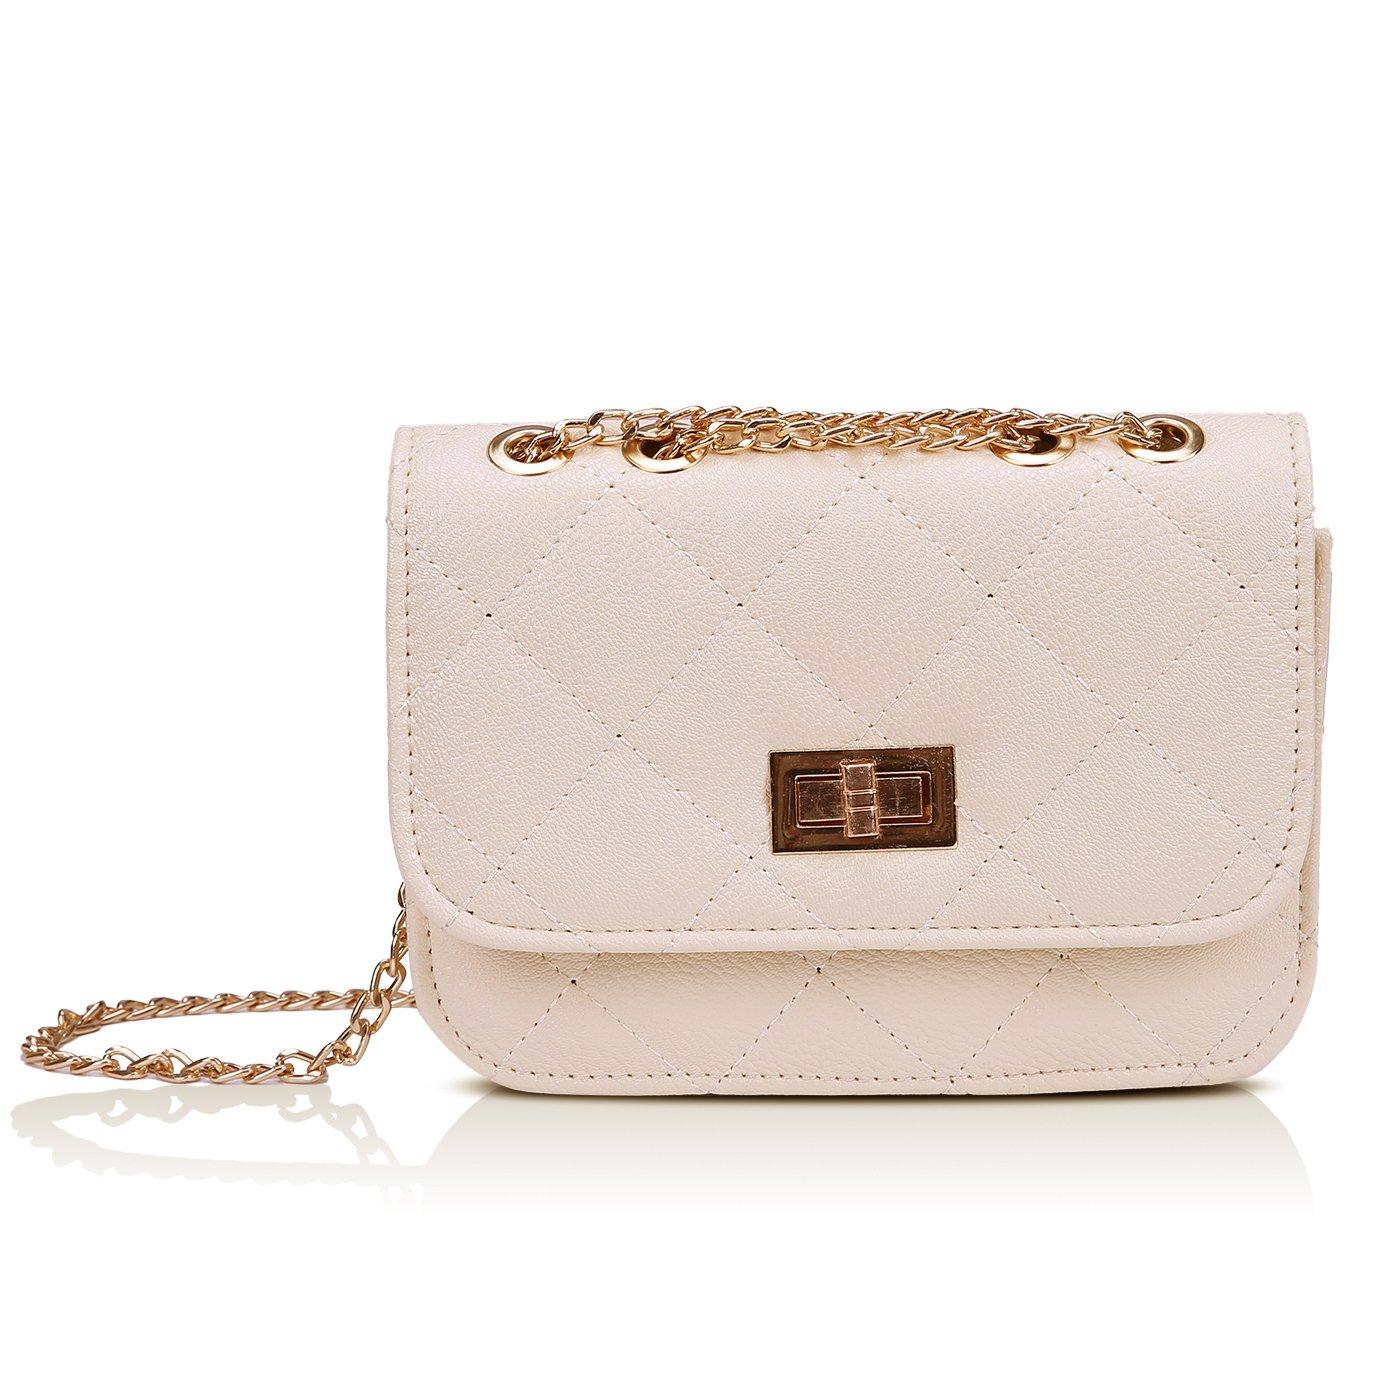 ec15c7b30ed7 Details about HDE Women s Small Crossbody Handbag Purse Bag with Chain  Shoulder Strap